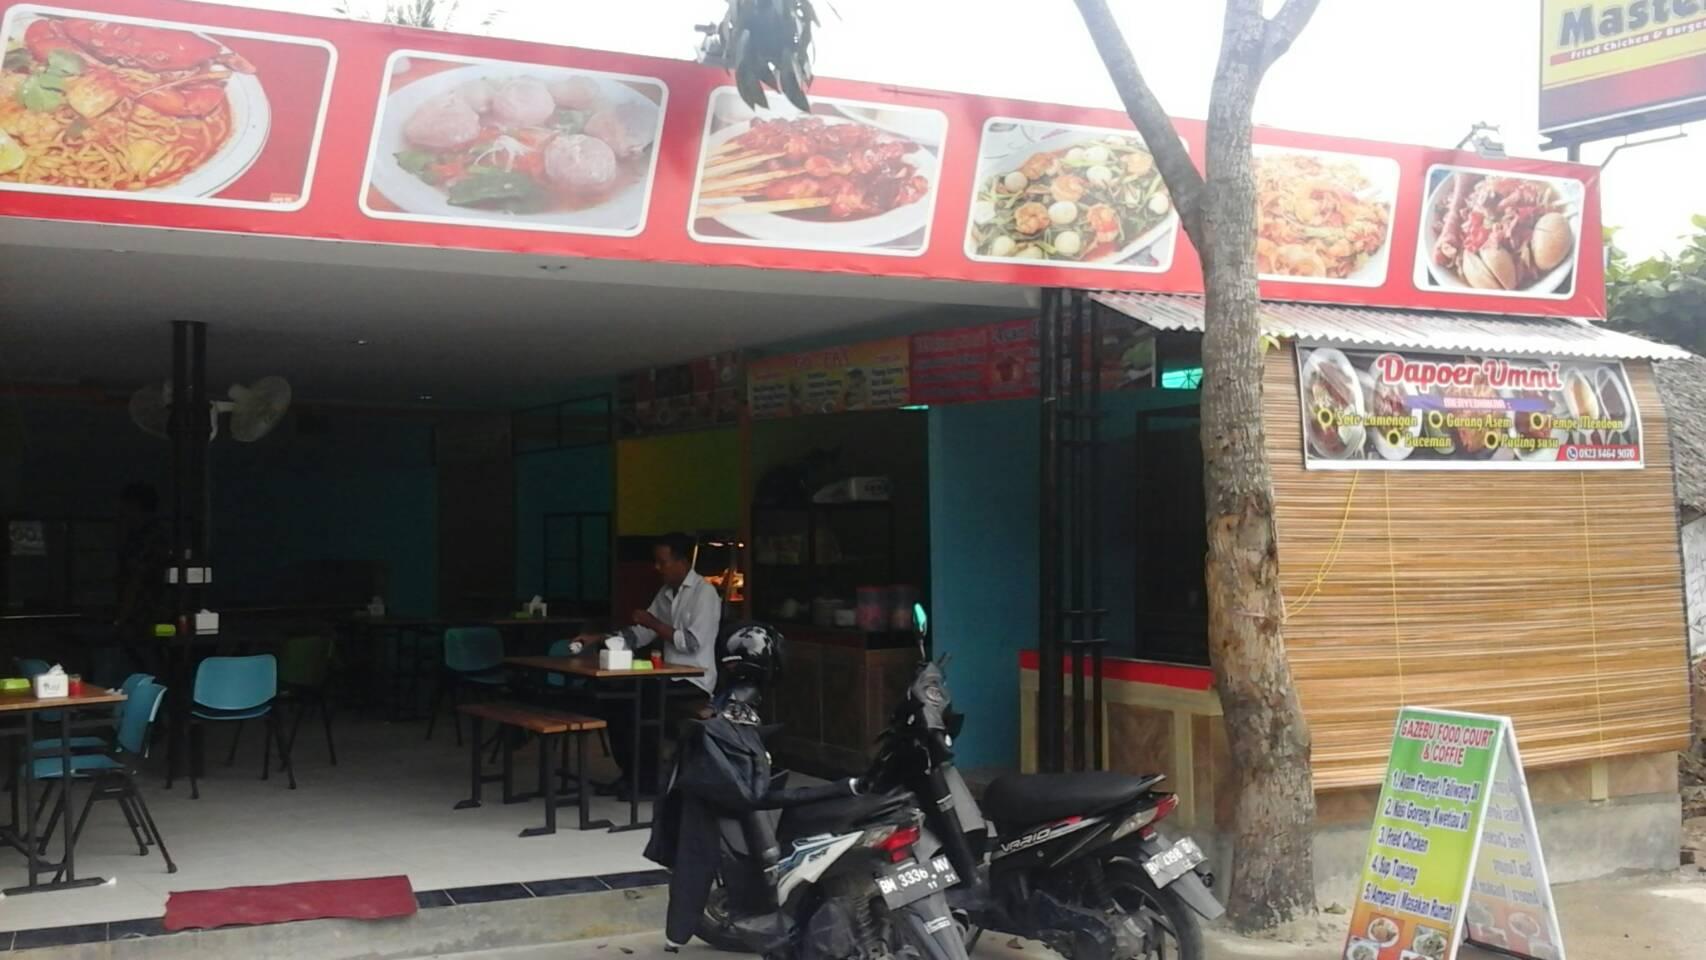 1504062142096 - Usaha Foodcourt And Coffee, Tempat Nongkrong Pekanbaru